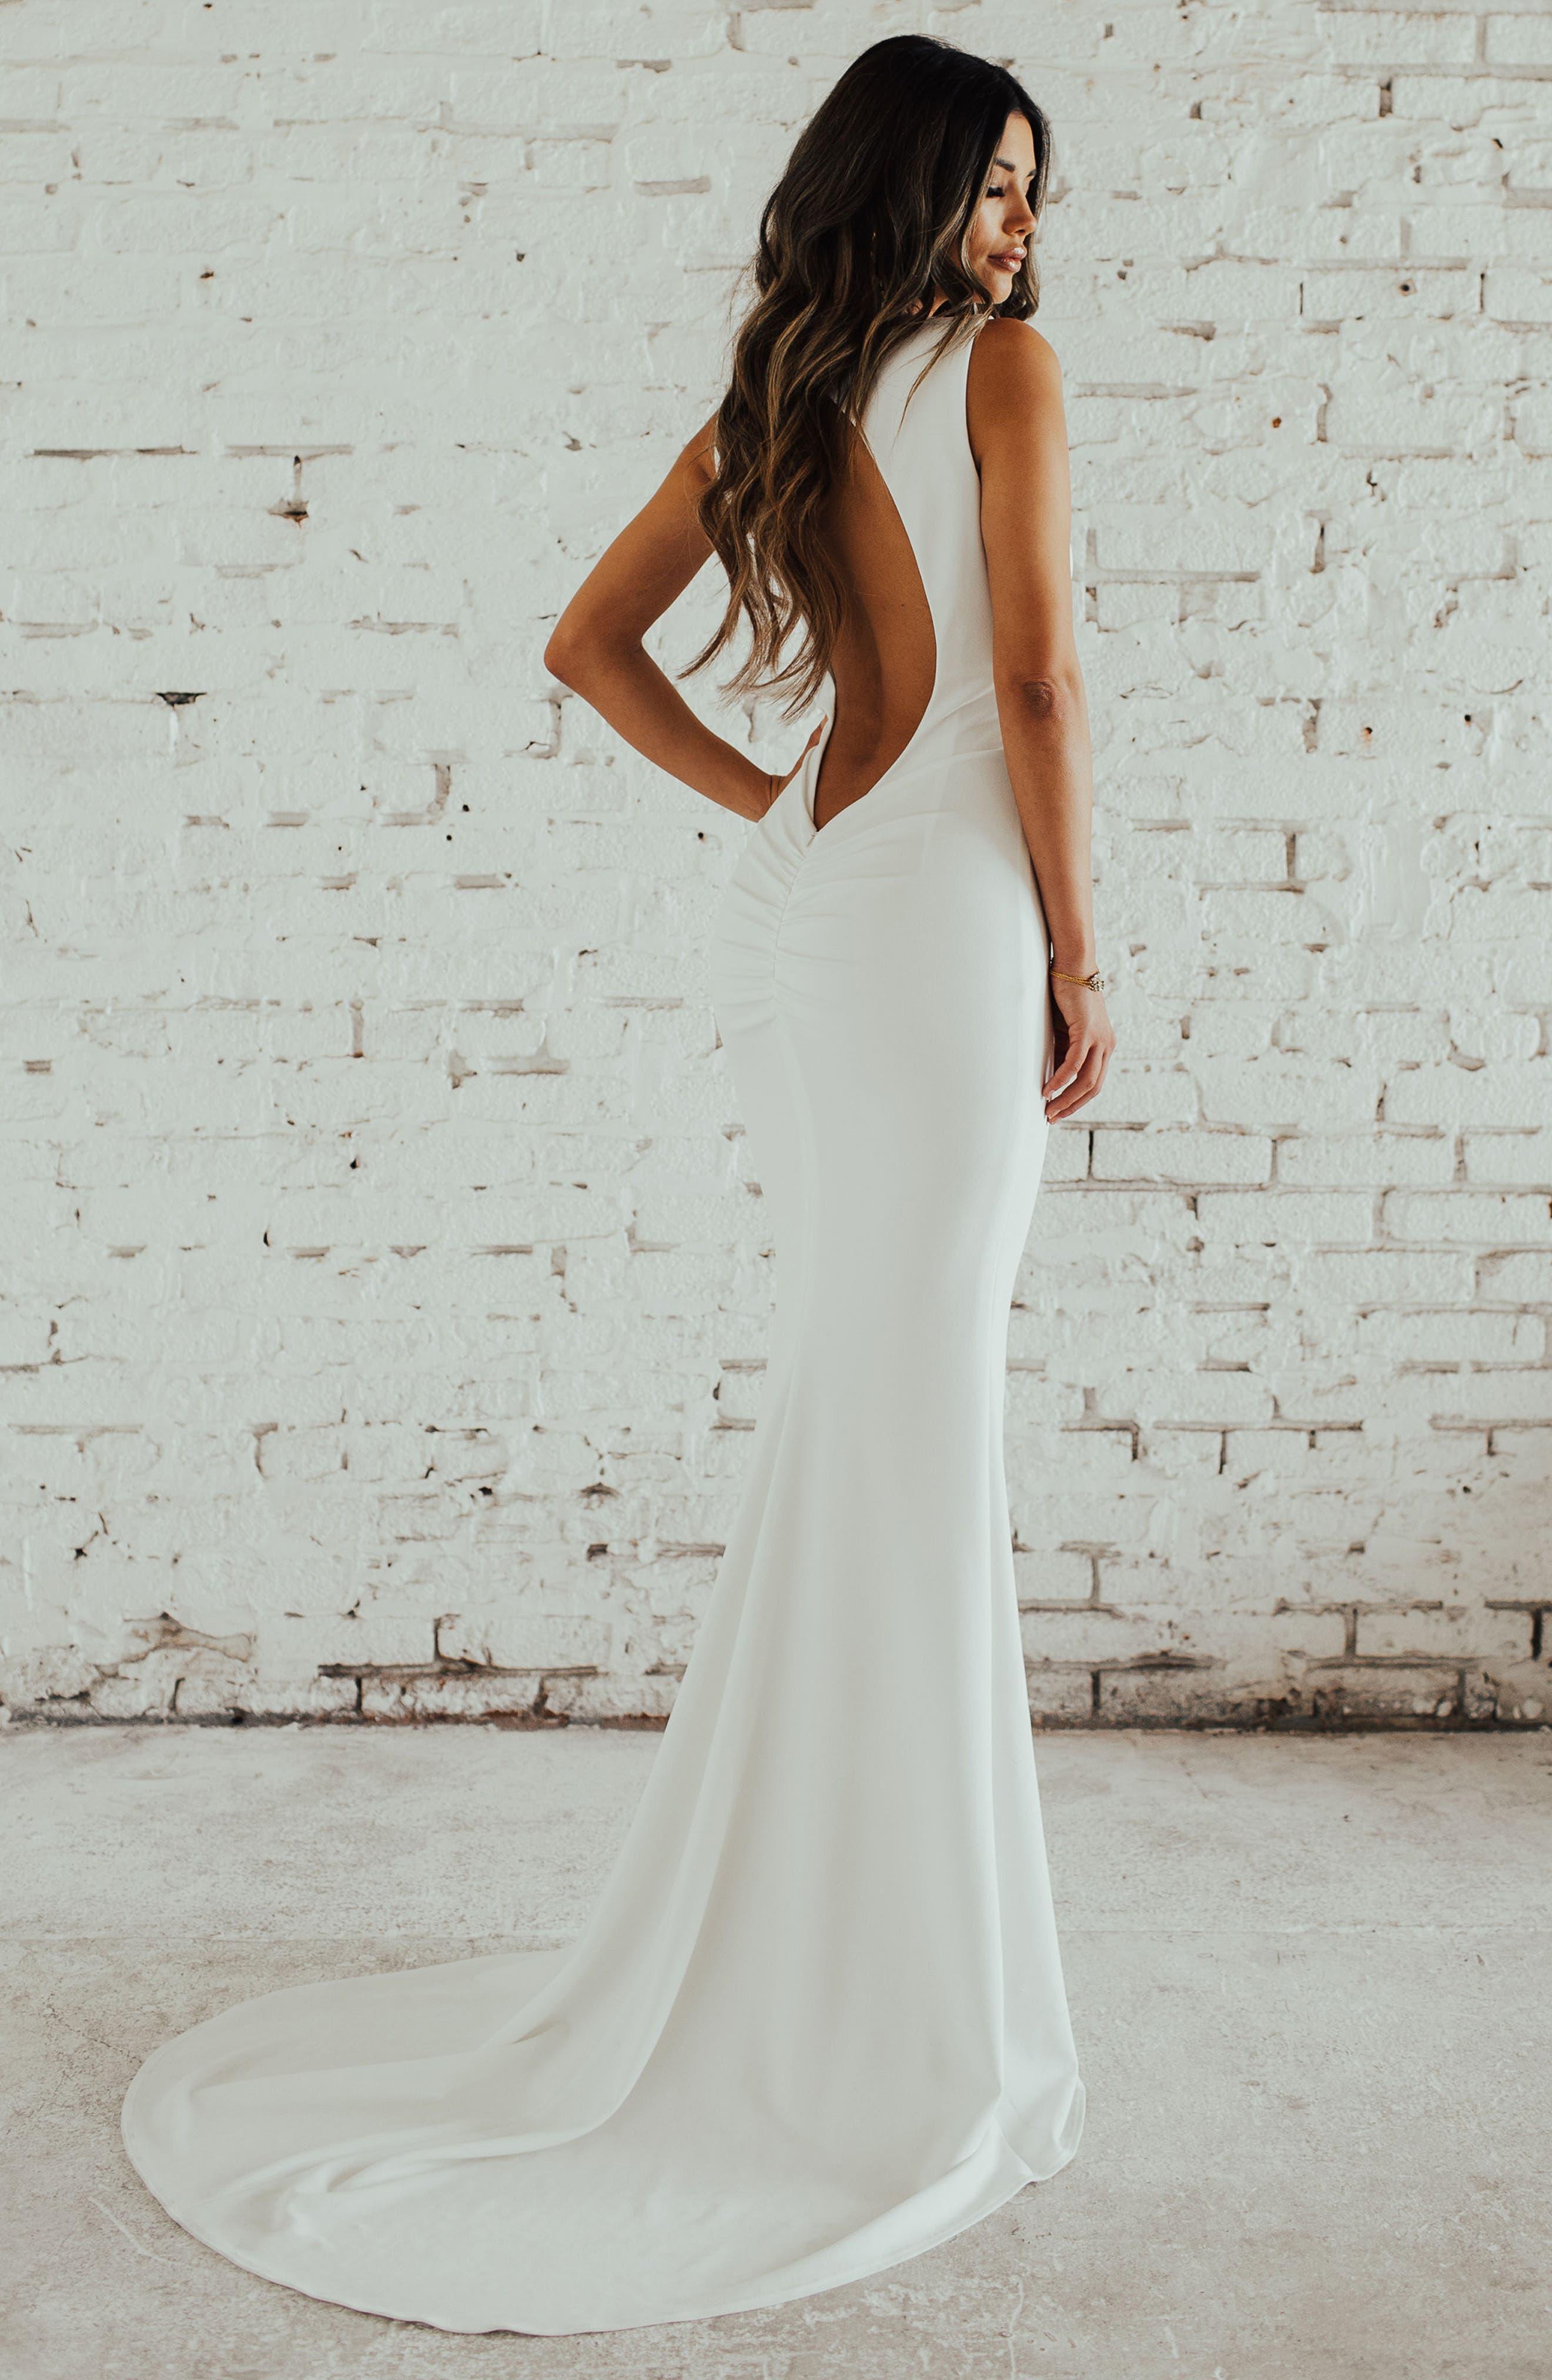 wedding dresses for petite girls